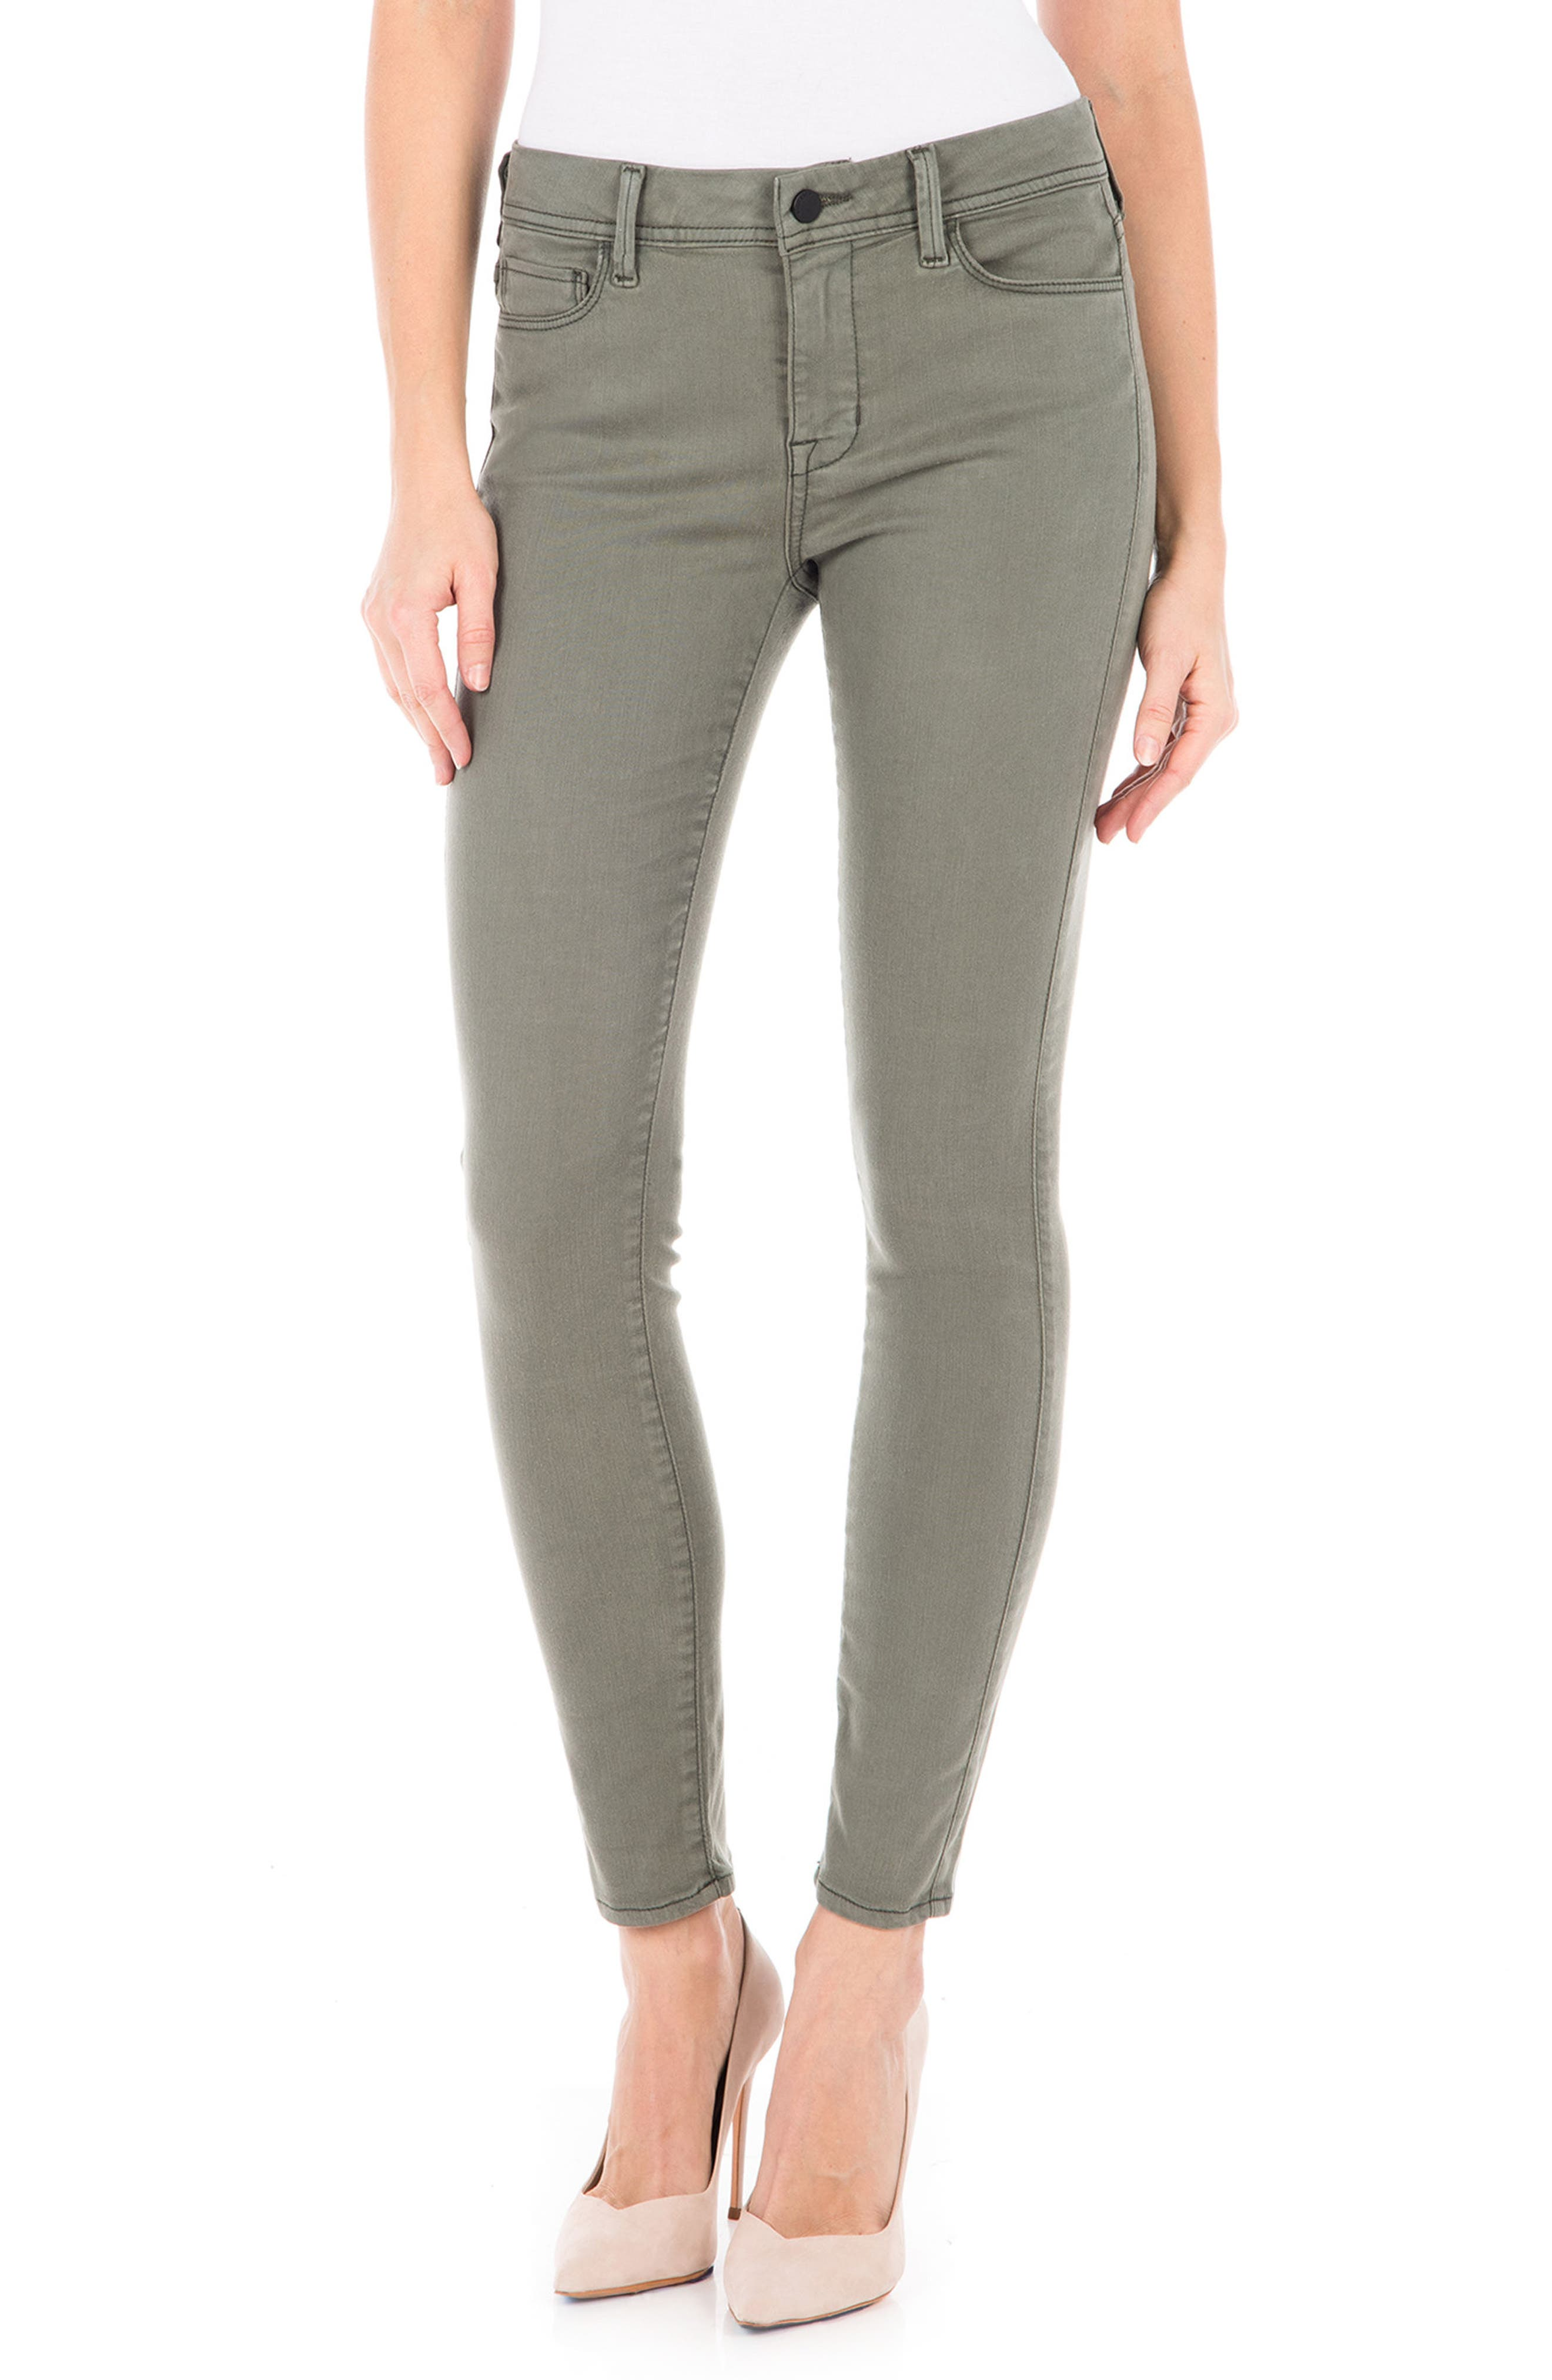 Sola Skinny Jeans,                             Main thumbnail 1, color,